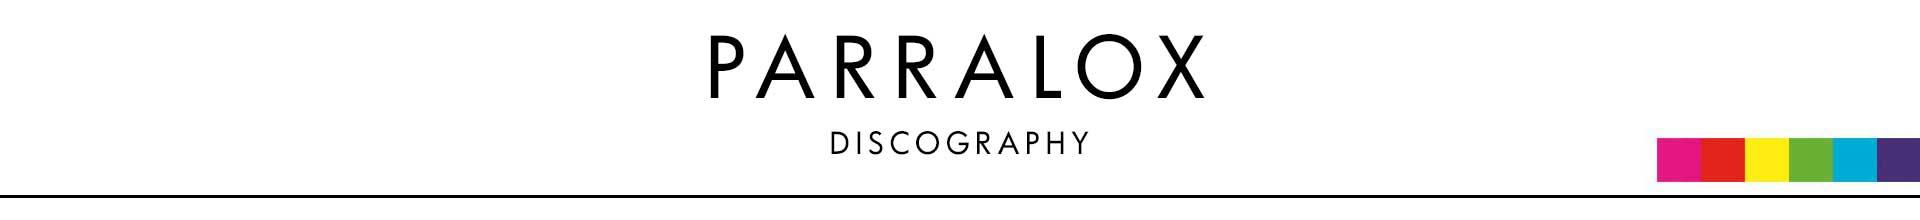 Parralox - Discography